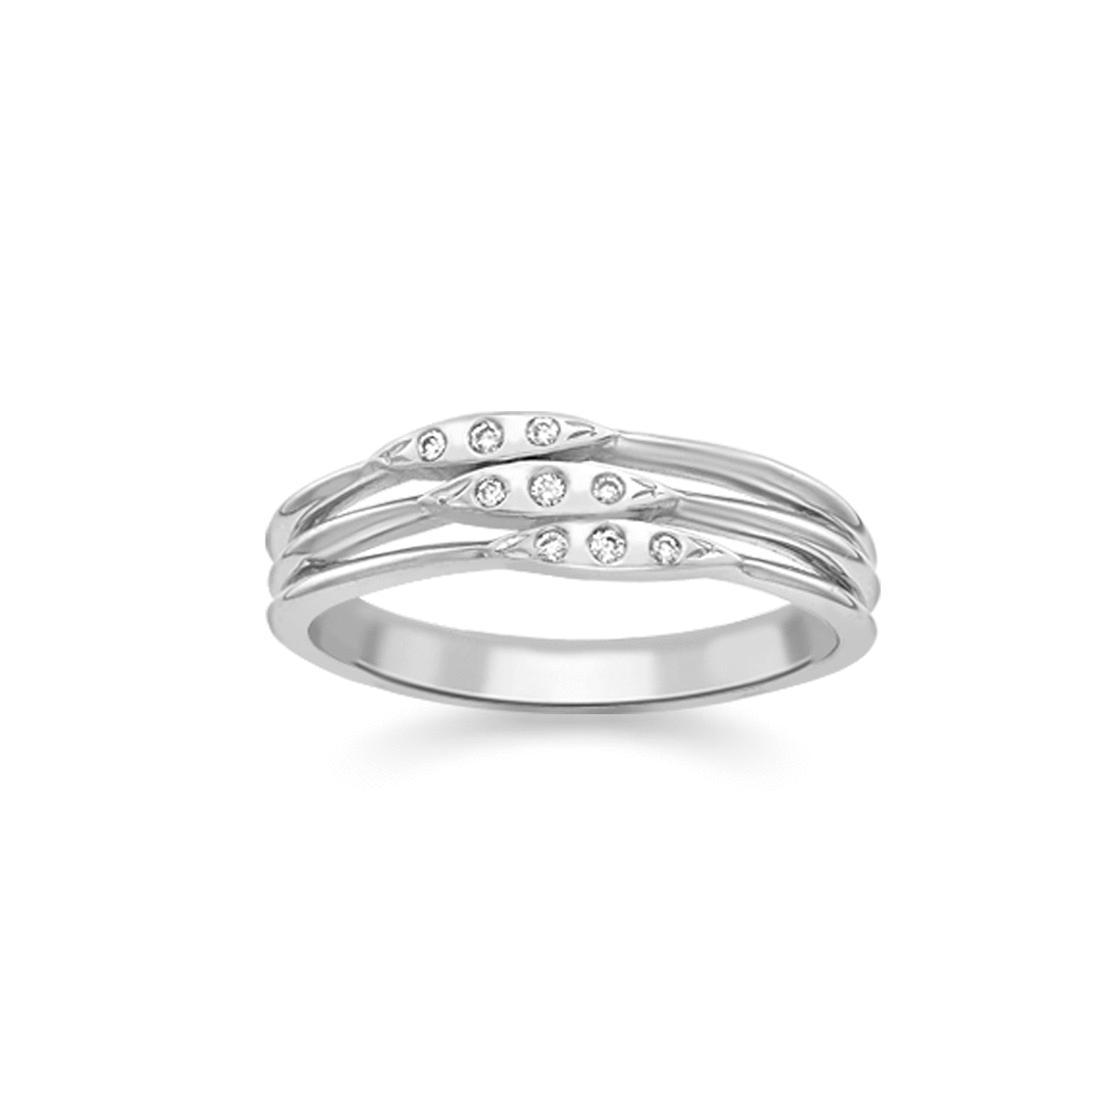 London Road Jewellery Portobello White Gold Diamond Velvet Leaf Single Row Ring 5KuoHbNBR